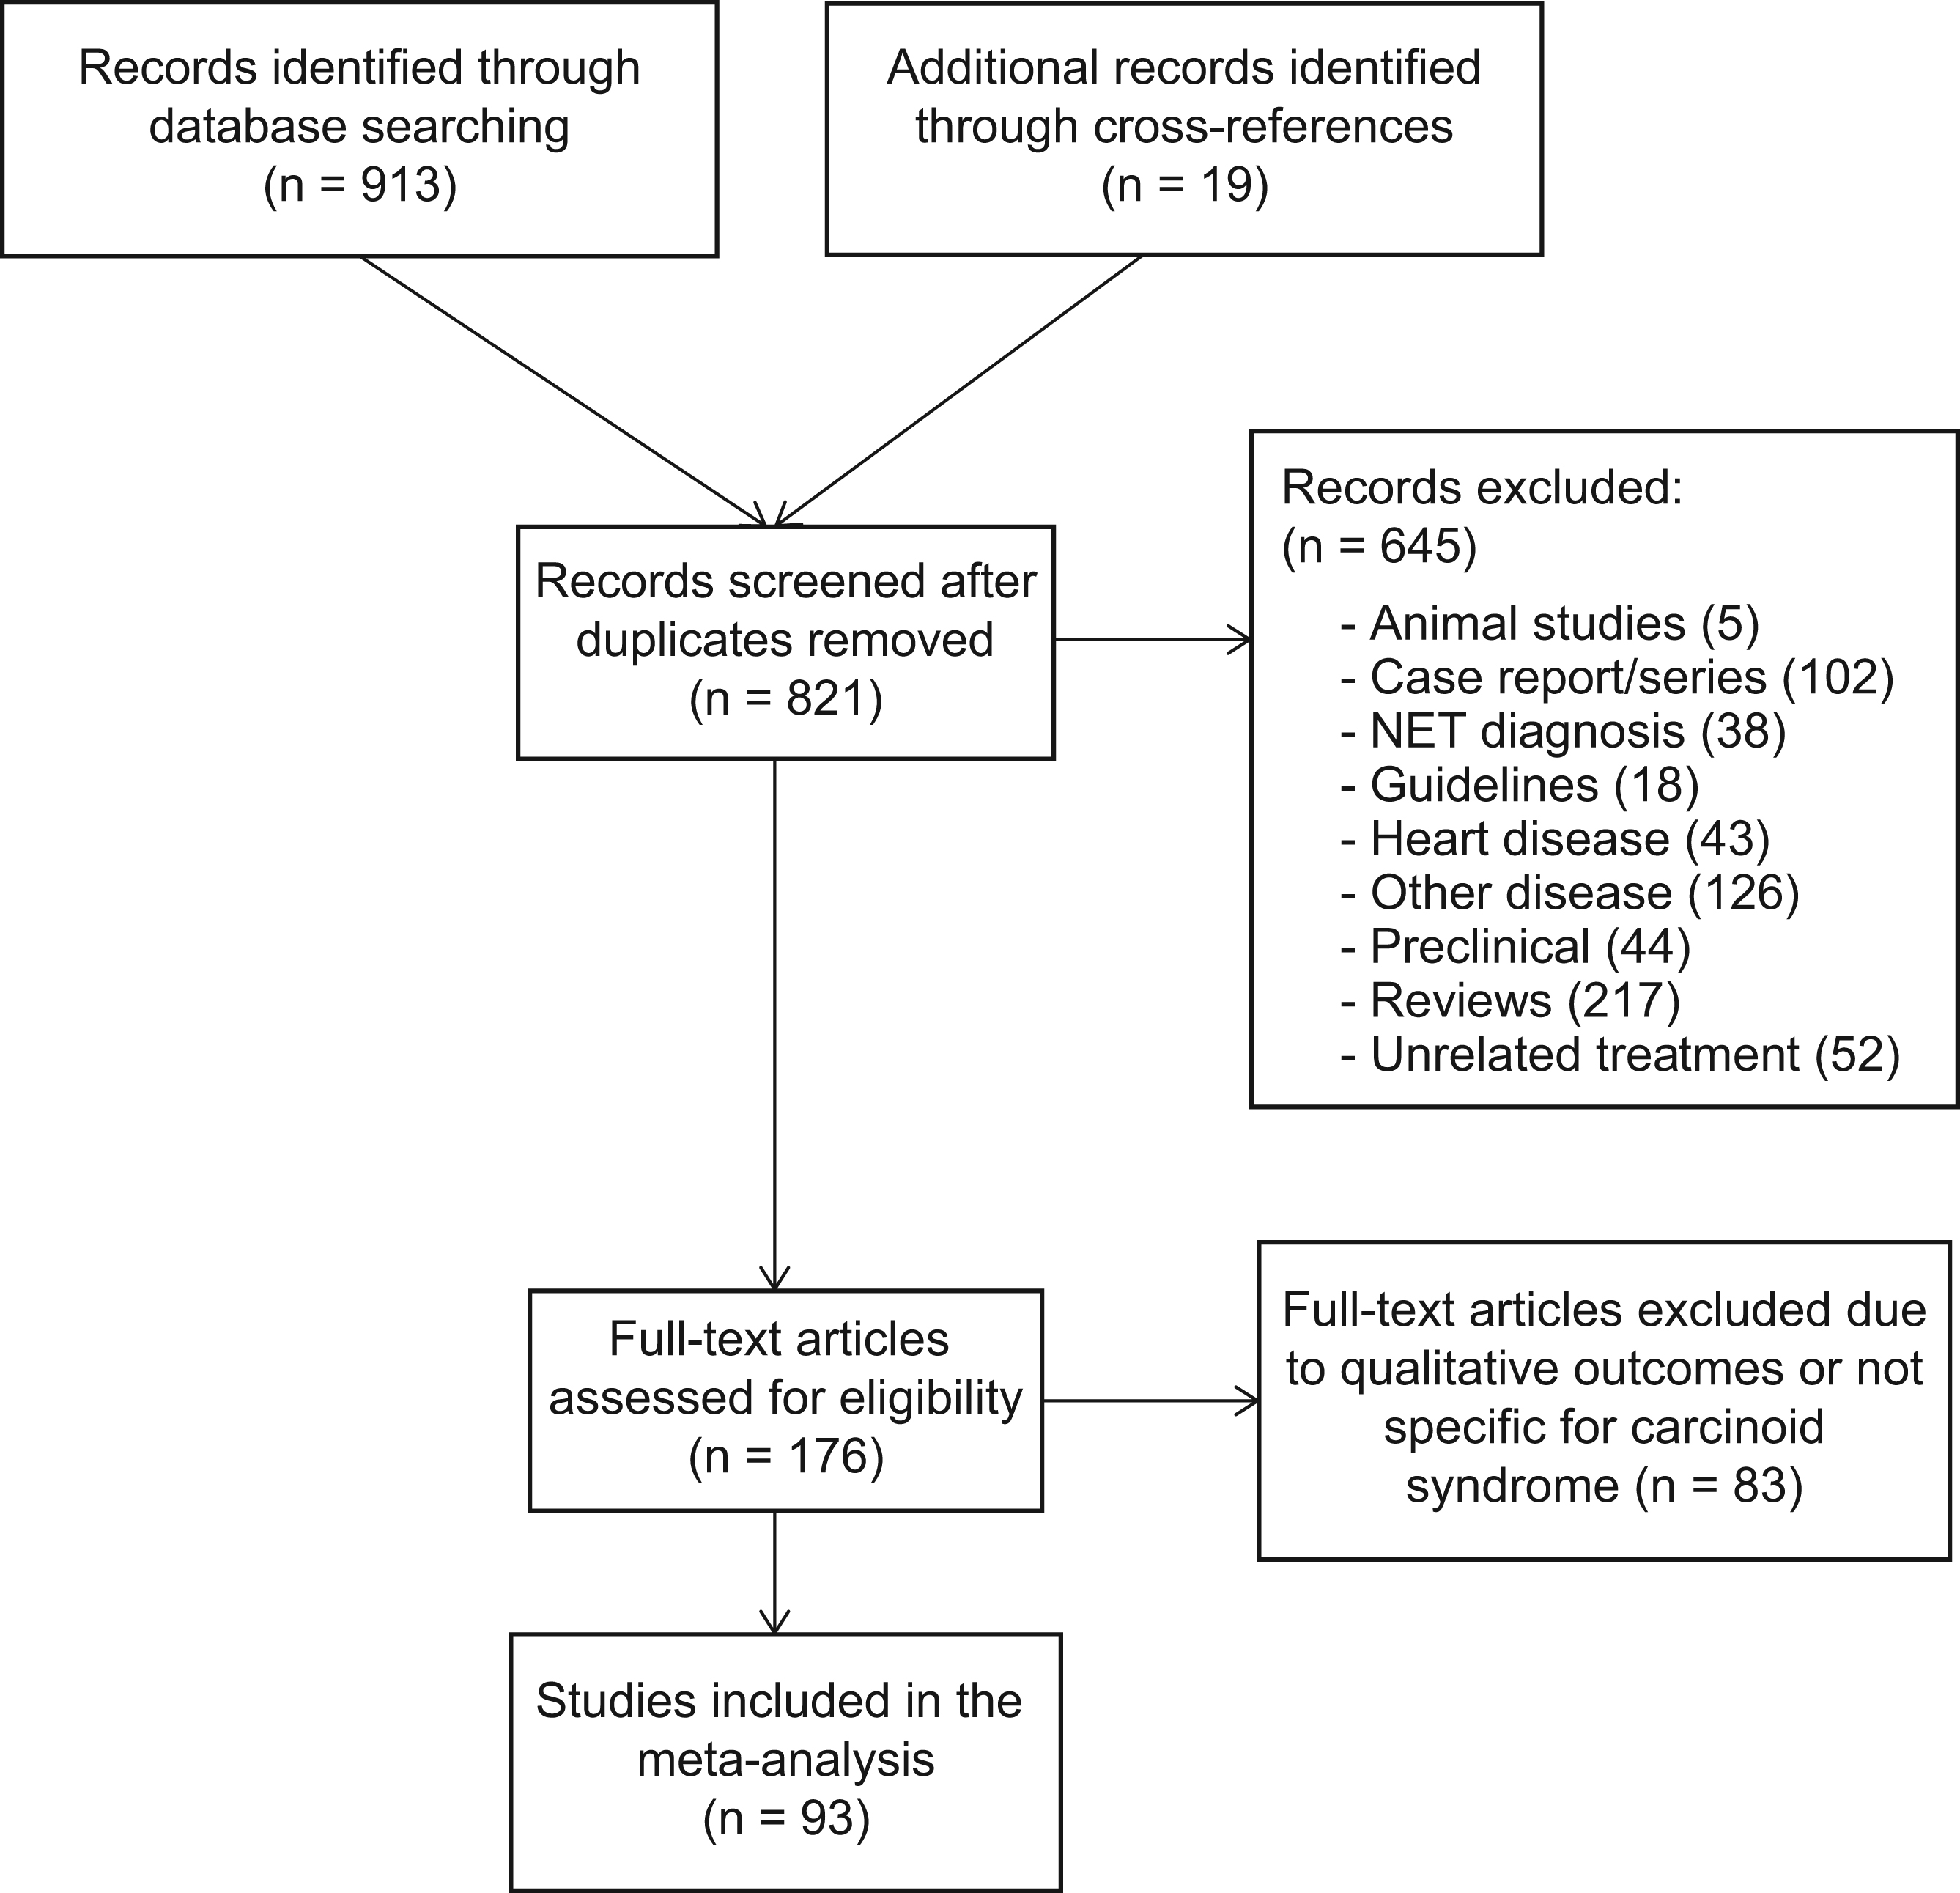 neuroendocrine cancer diarrhea